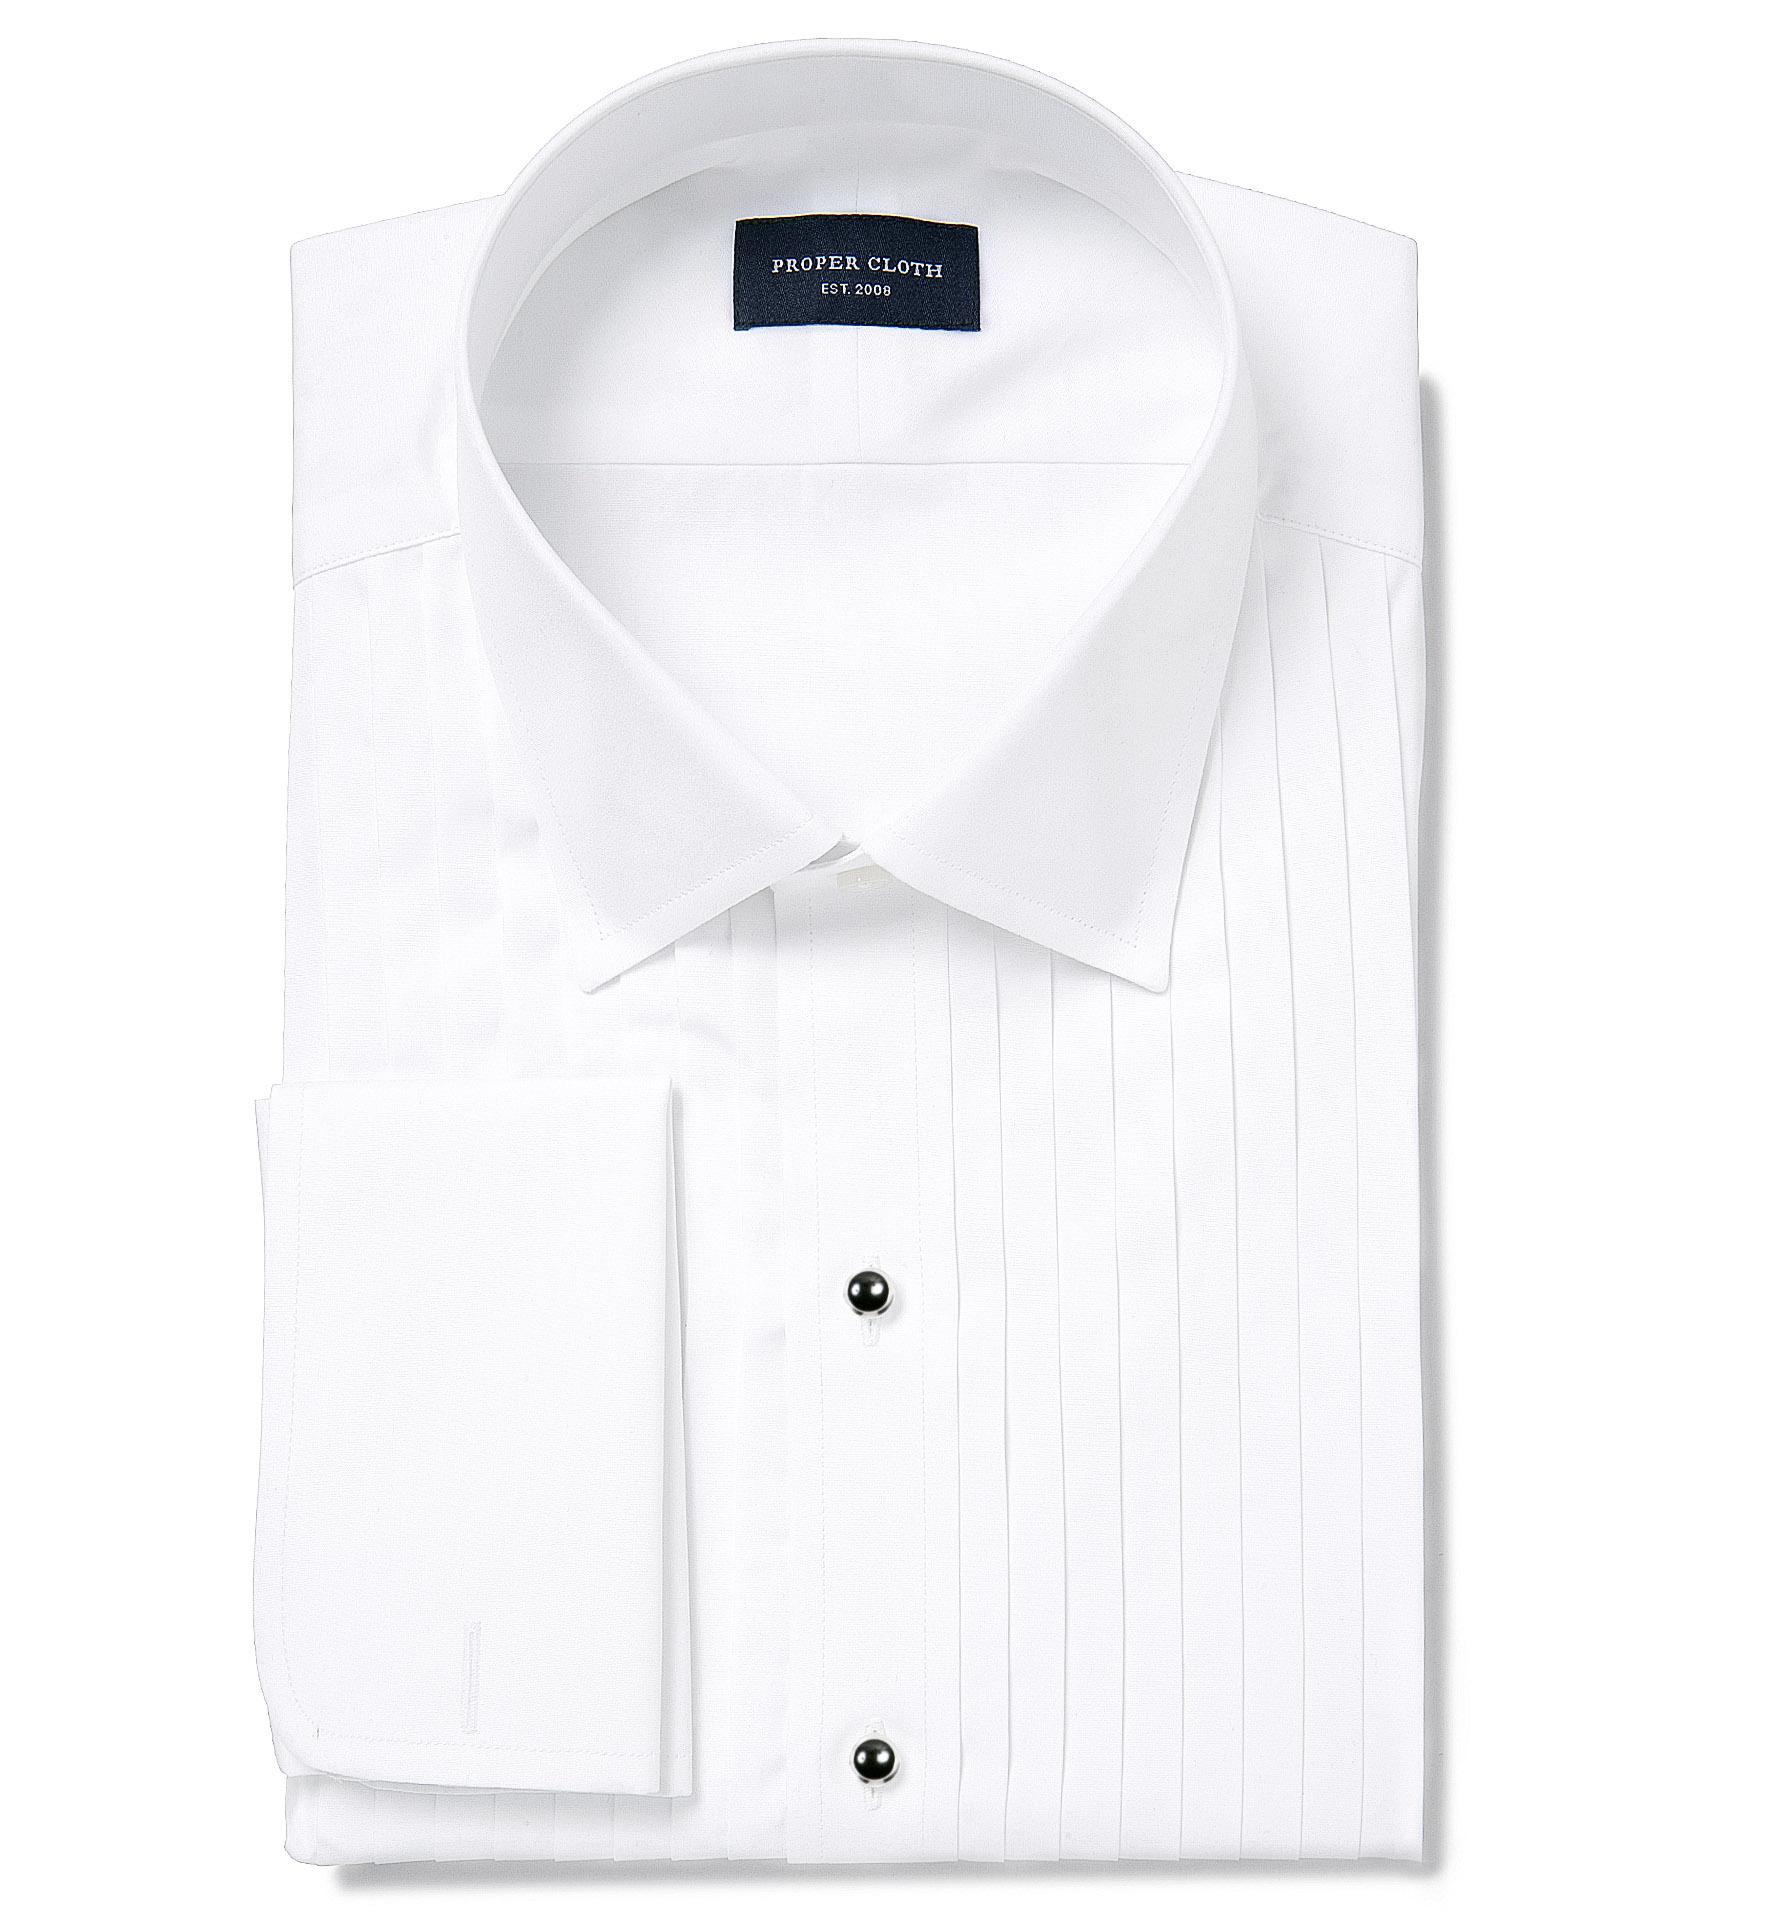 Thomas Mason White Luxury Broadcloth Custom Made Shirt By